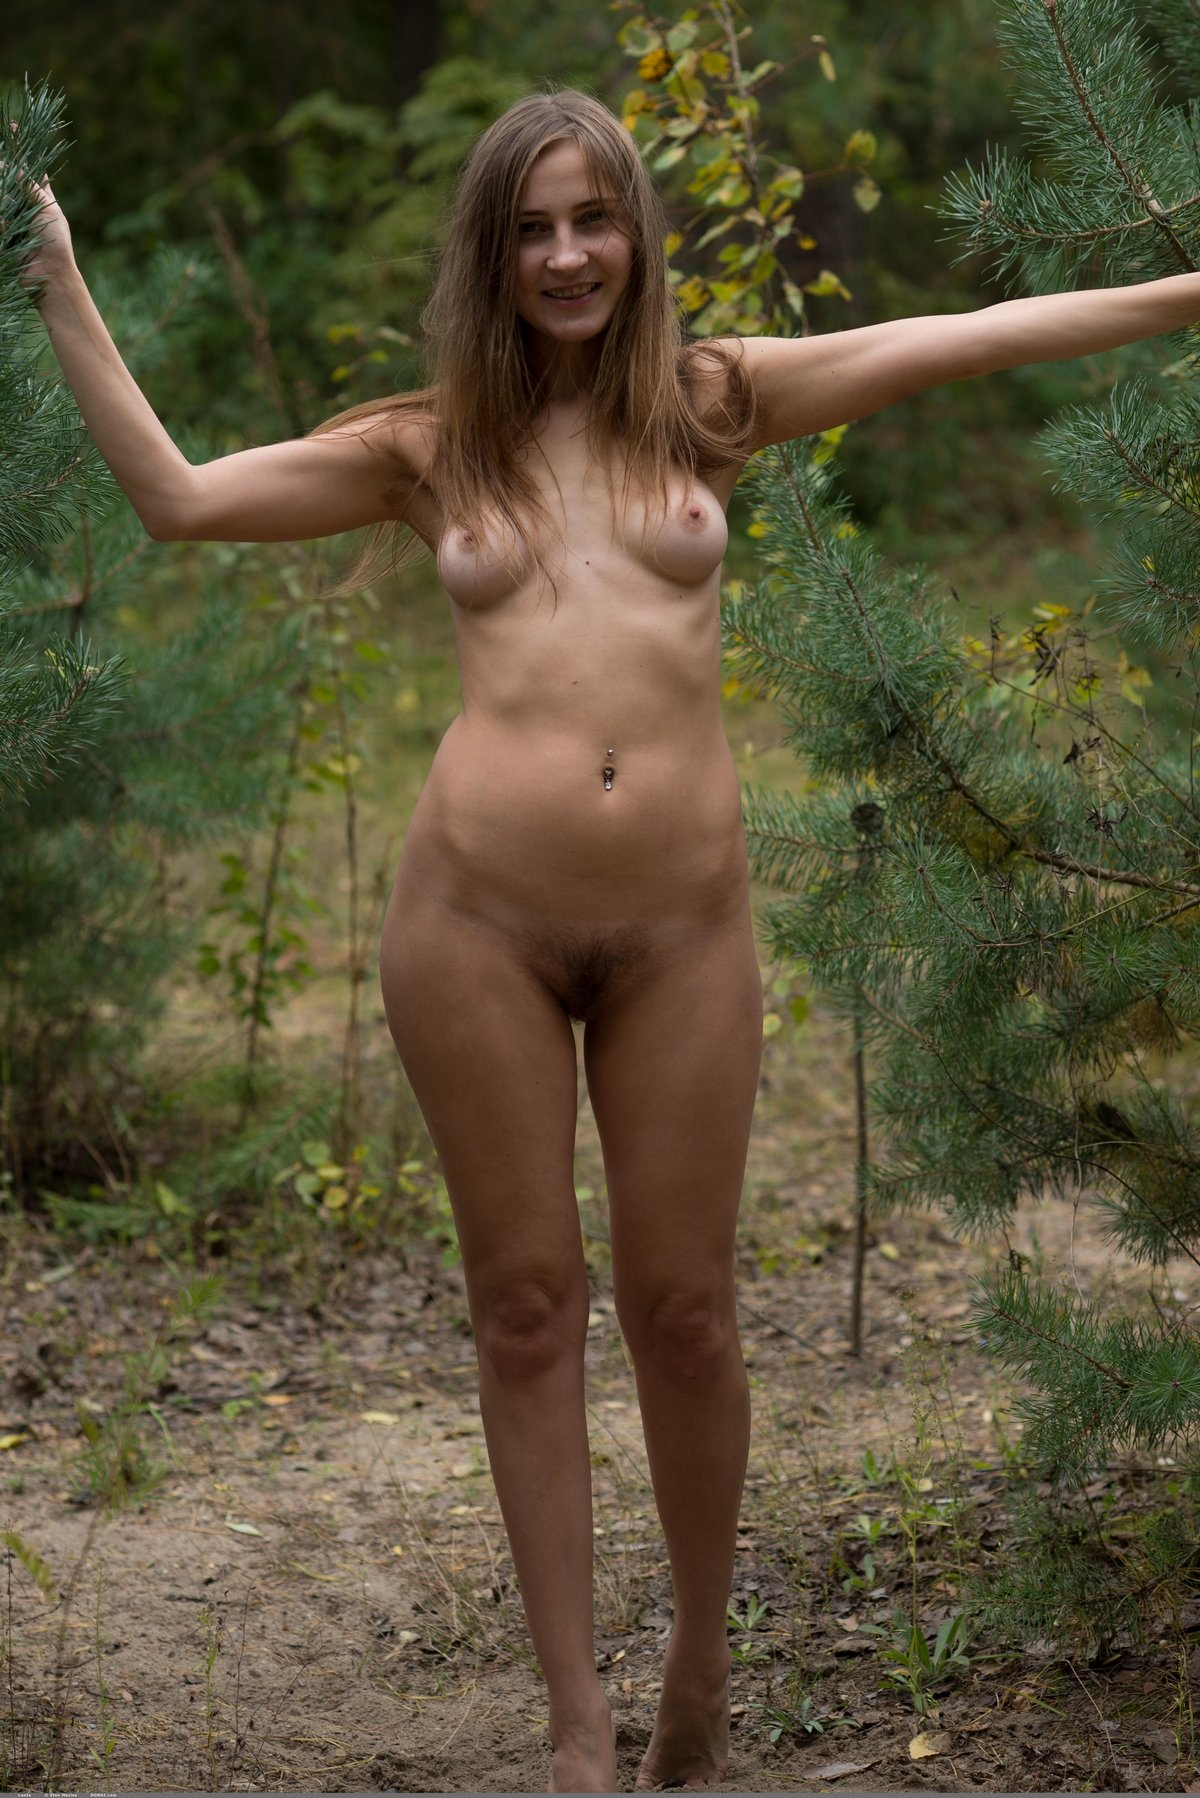 Нагая леди под елкой секс фото